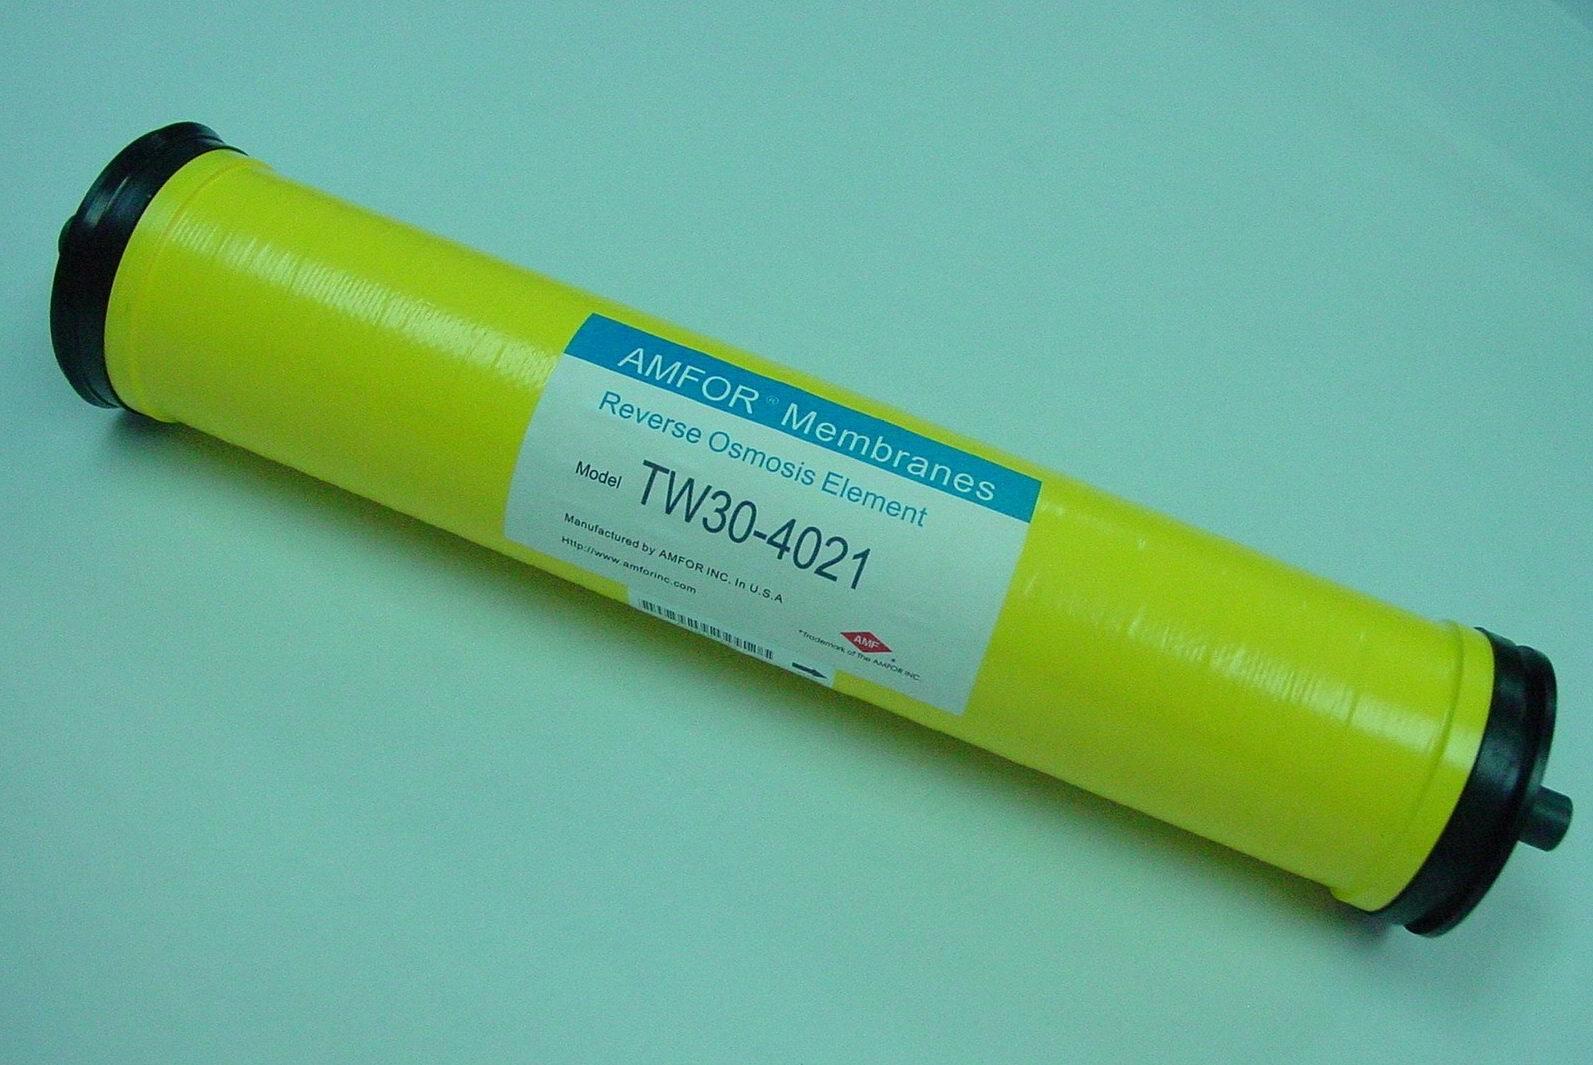 2.5 Inch & 4 Inch RO Membrane Element - TW30-4021